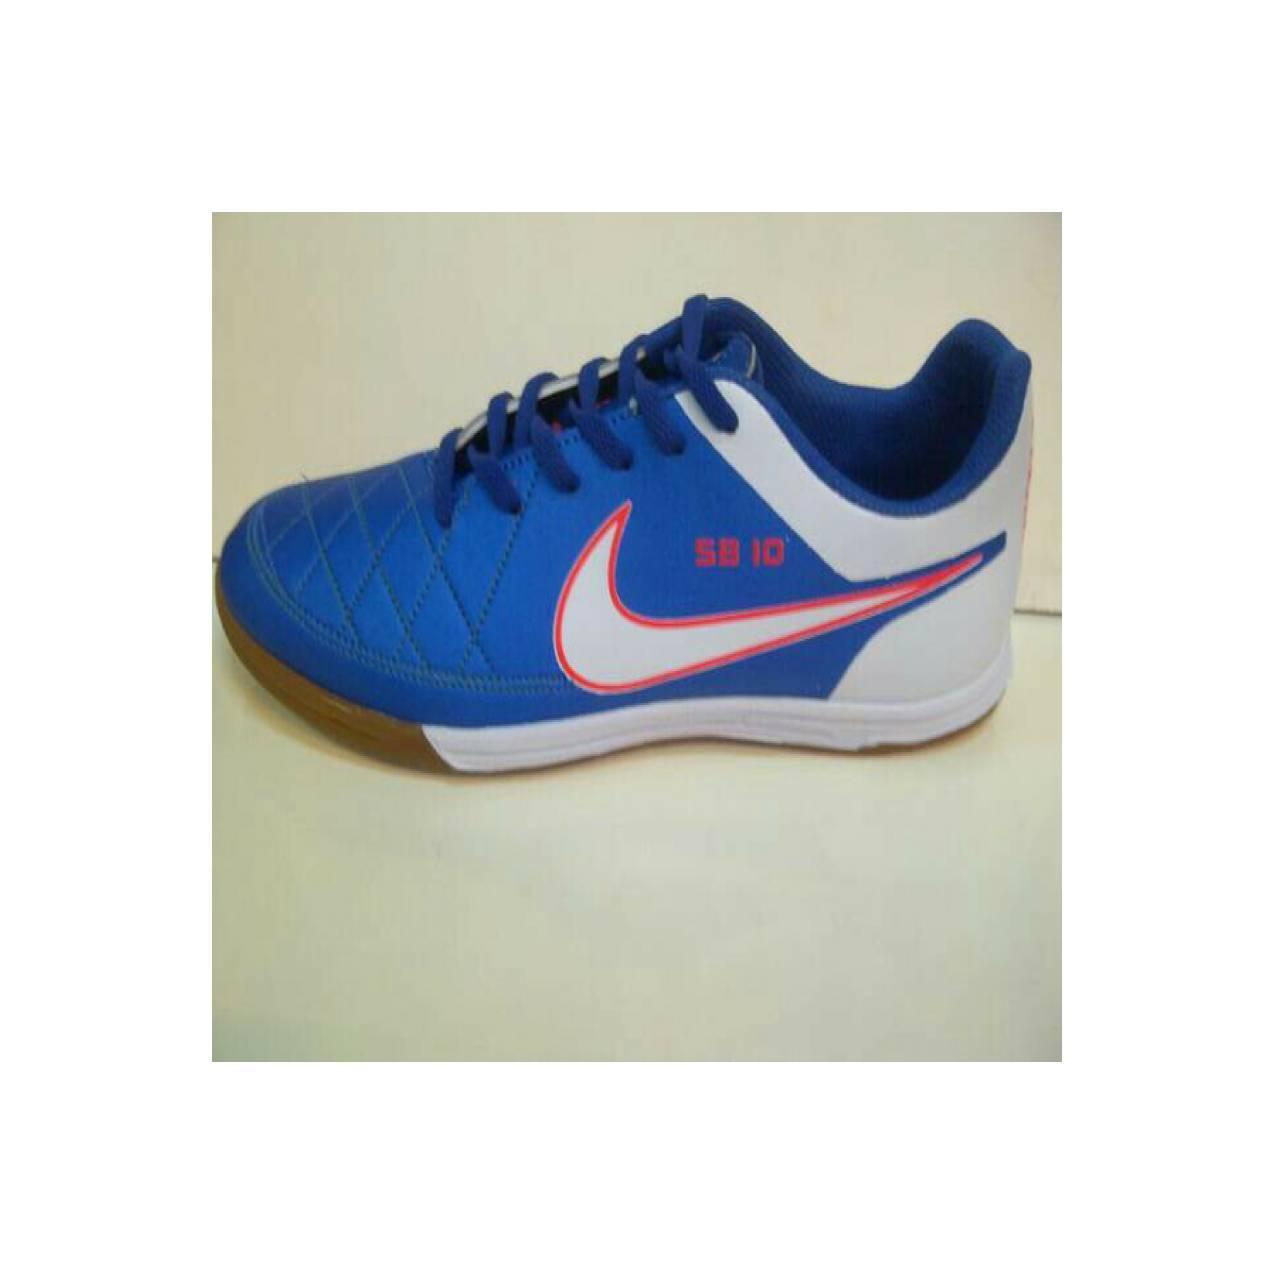 sepatu futsal NIKE SB10 warna biru